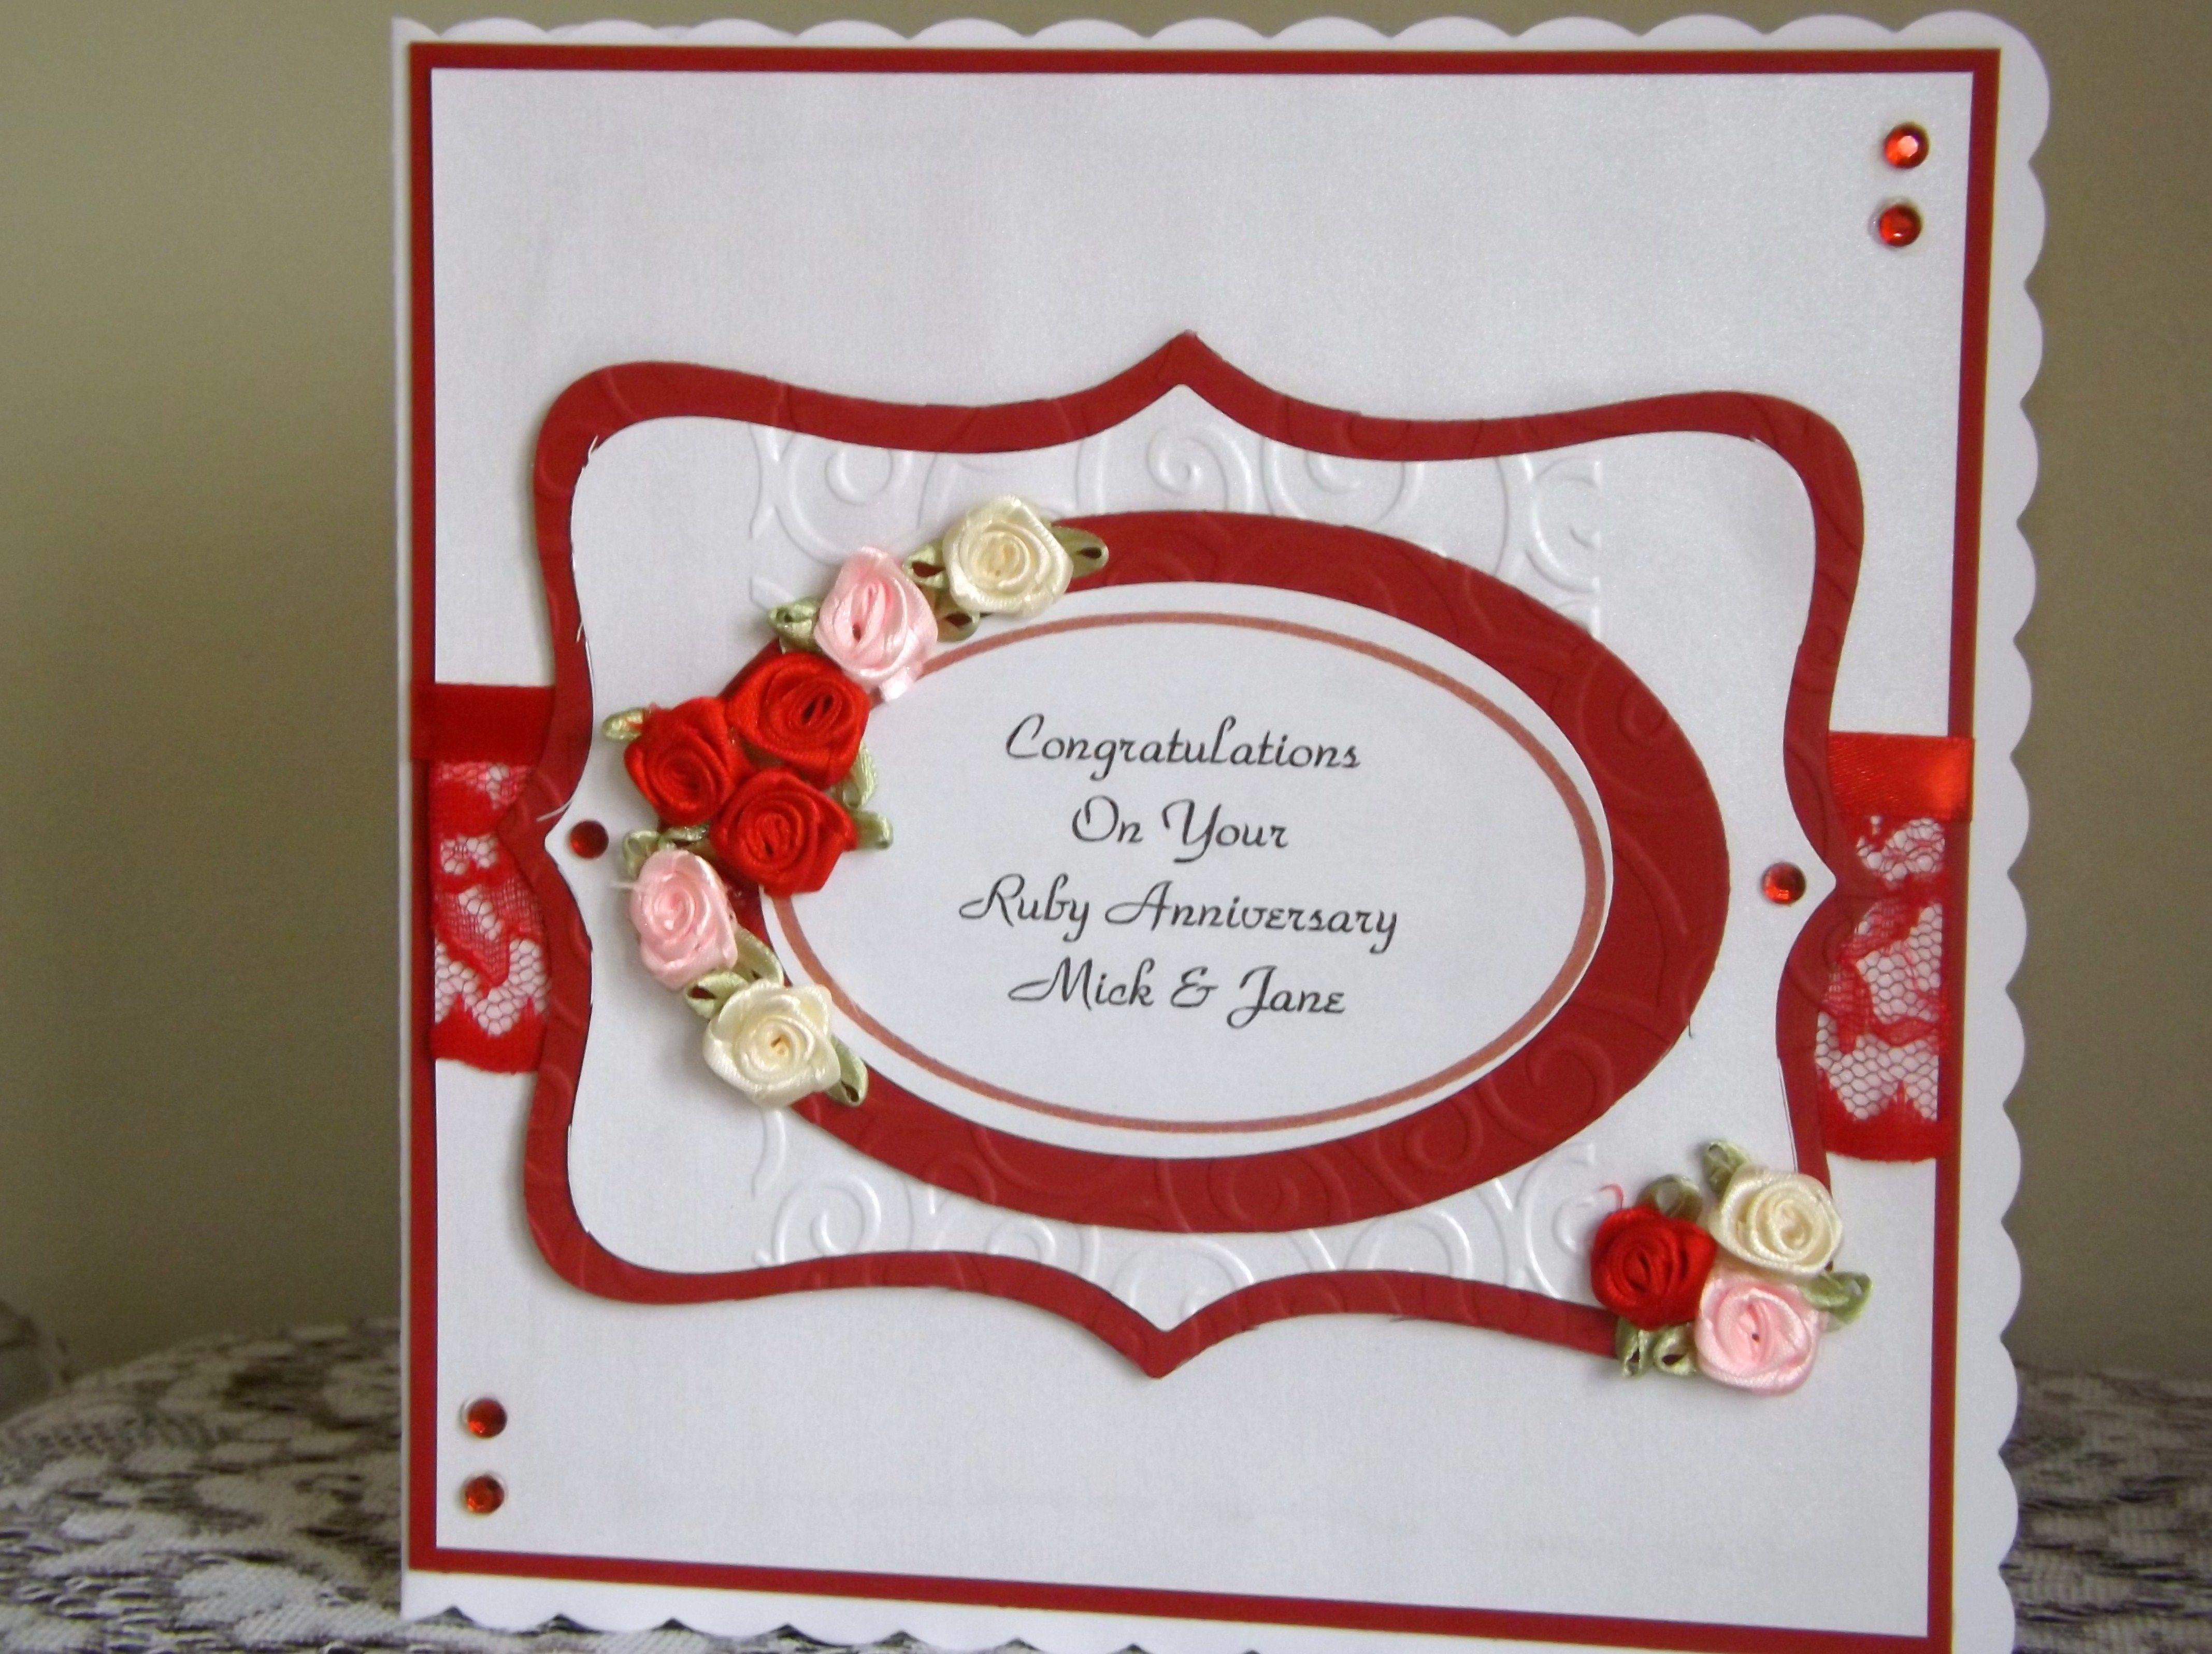 Ruby Anniversary 40th Birthday Cards Wedding Anniversary